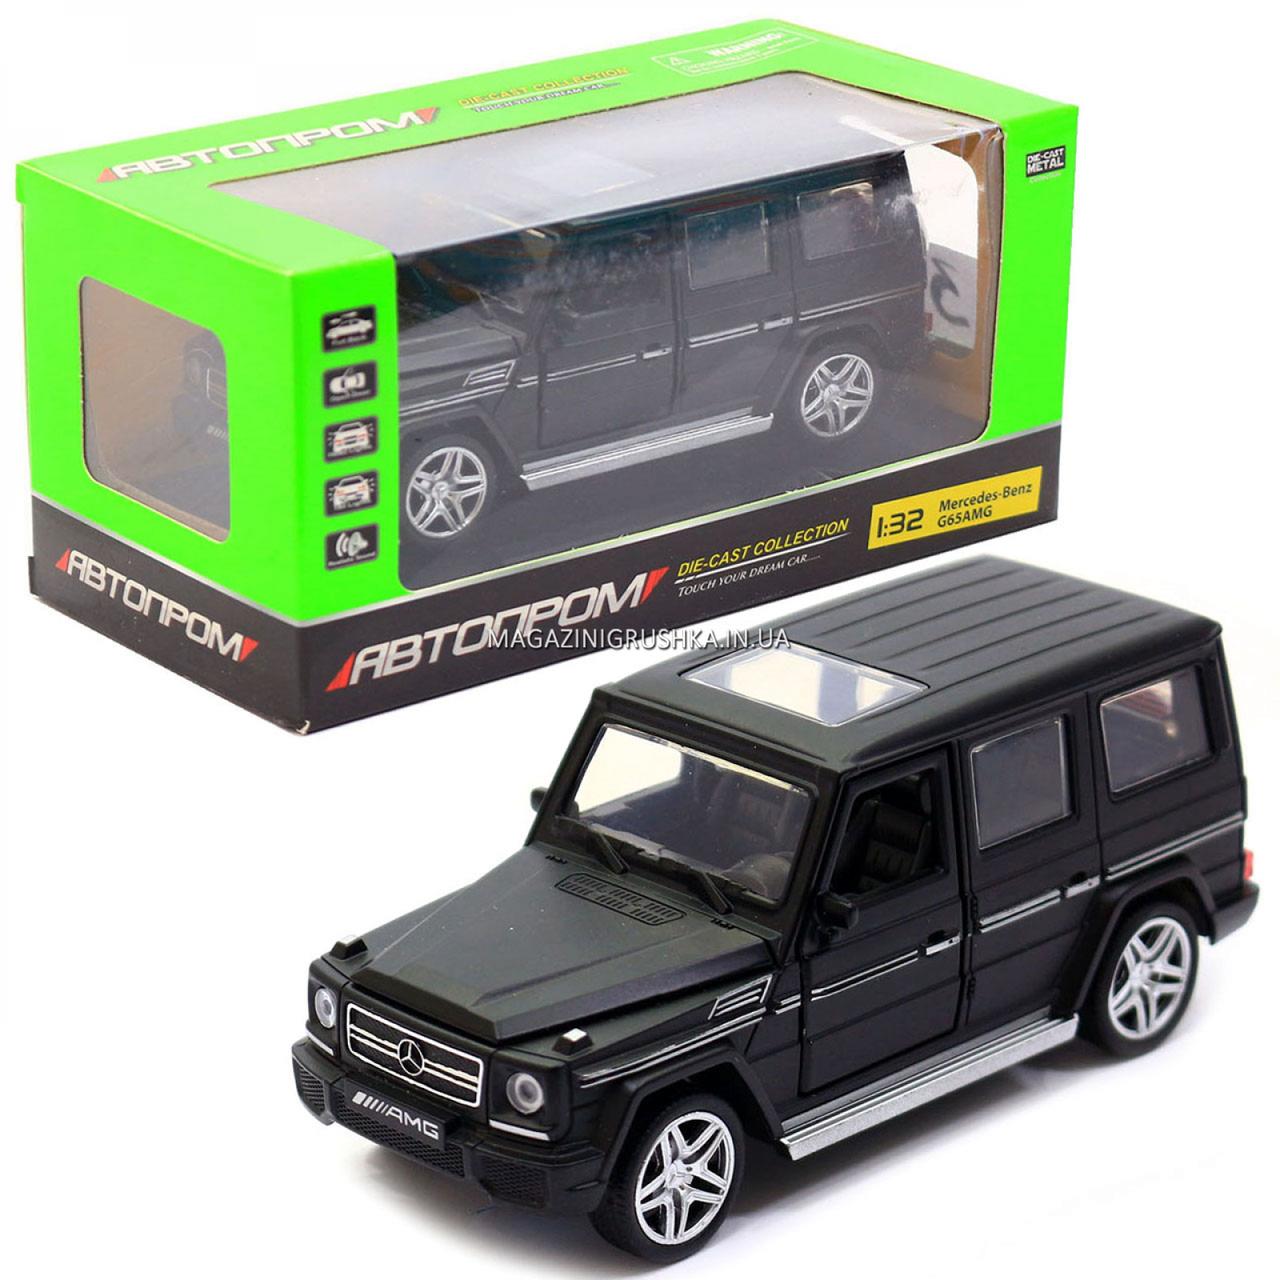 Іграшка машина Автопром Мерседес Бенц (Mercedes-Benz) Гелендваген (Гелик) (3201G)